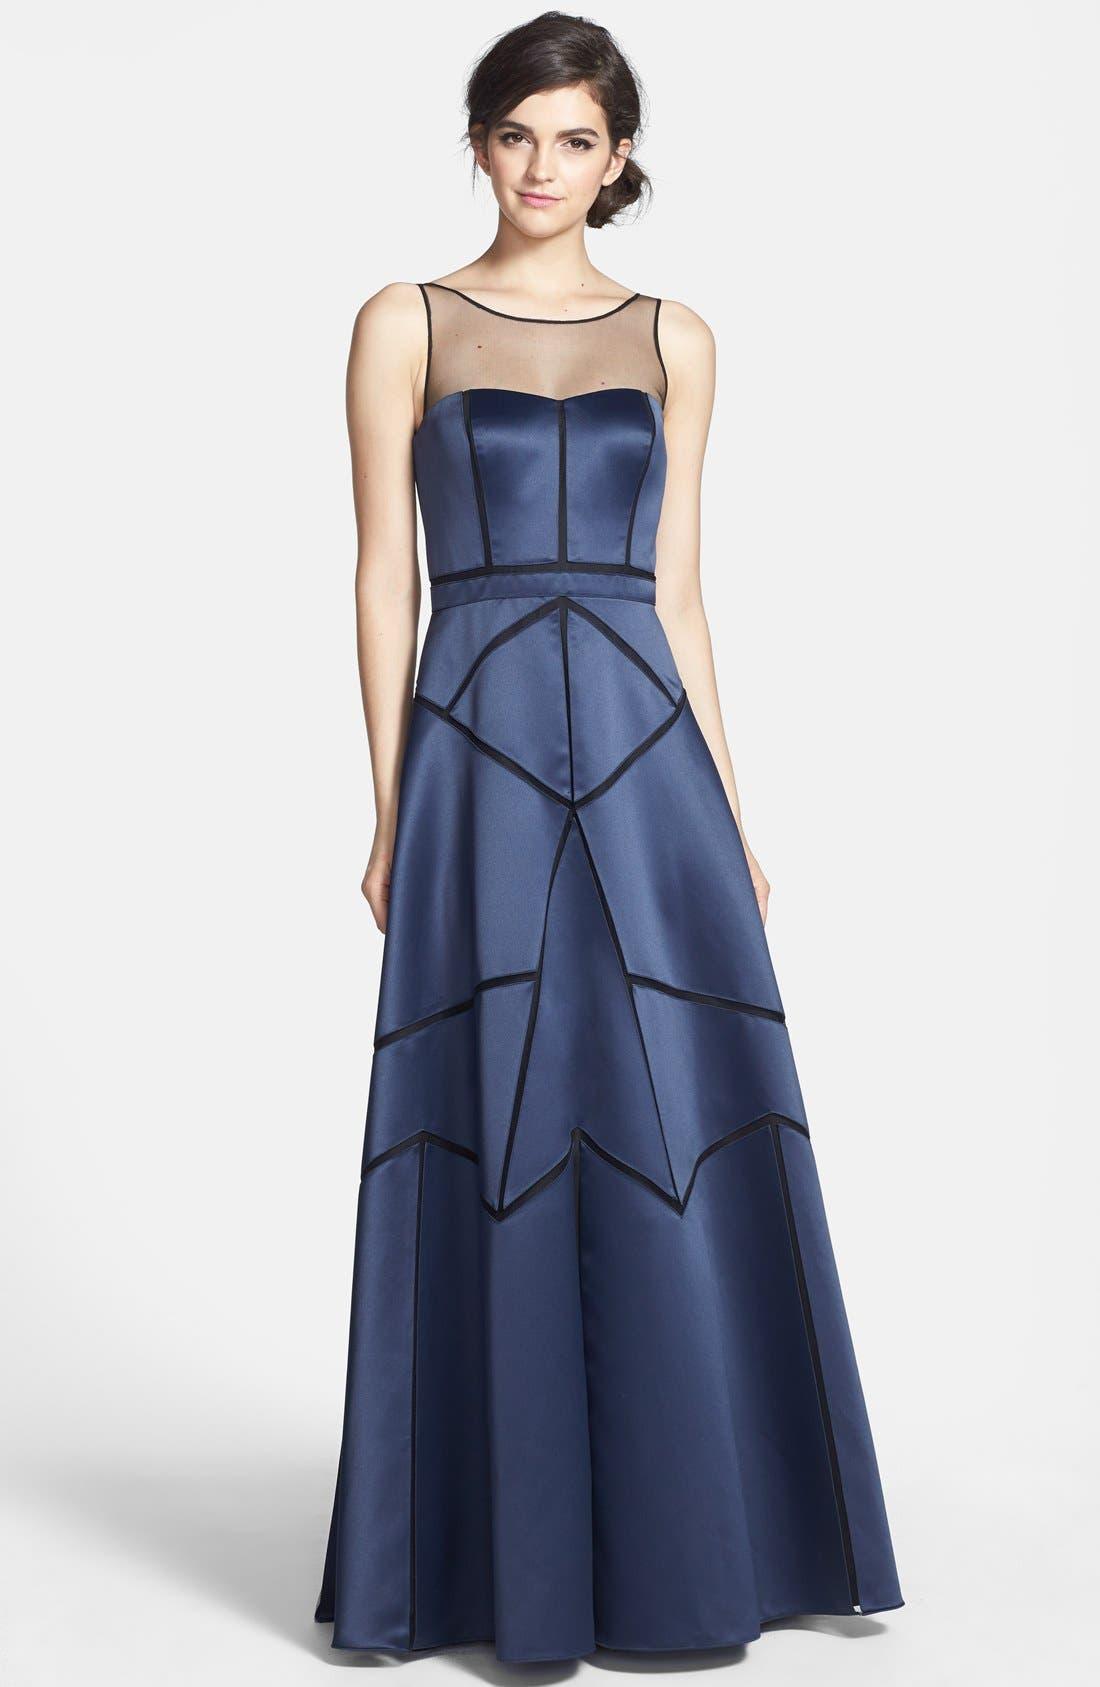 Alternate Image 1 Selected - Aidan Mattox Illusion Neck Seam Detail Satin Gown